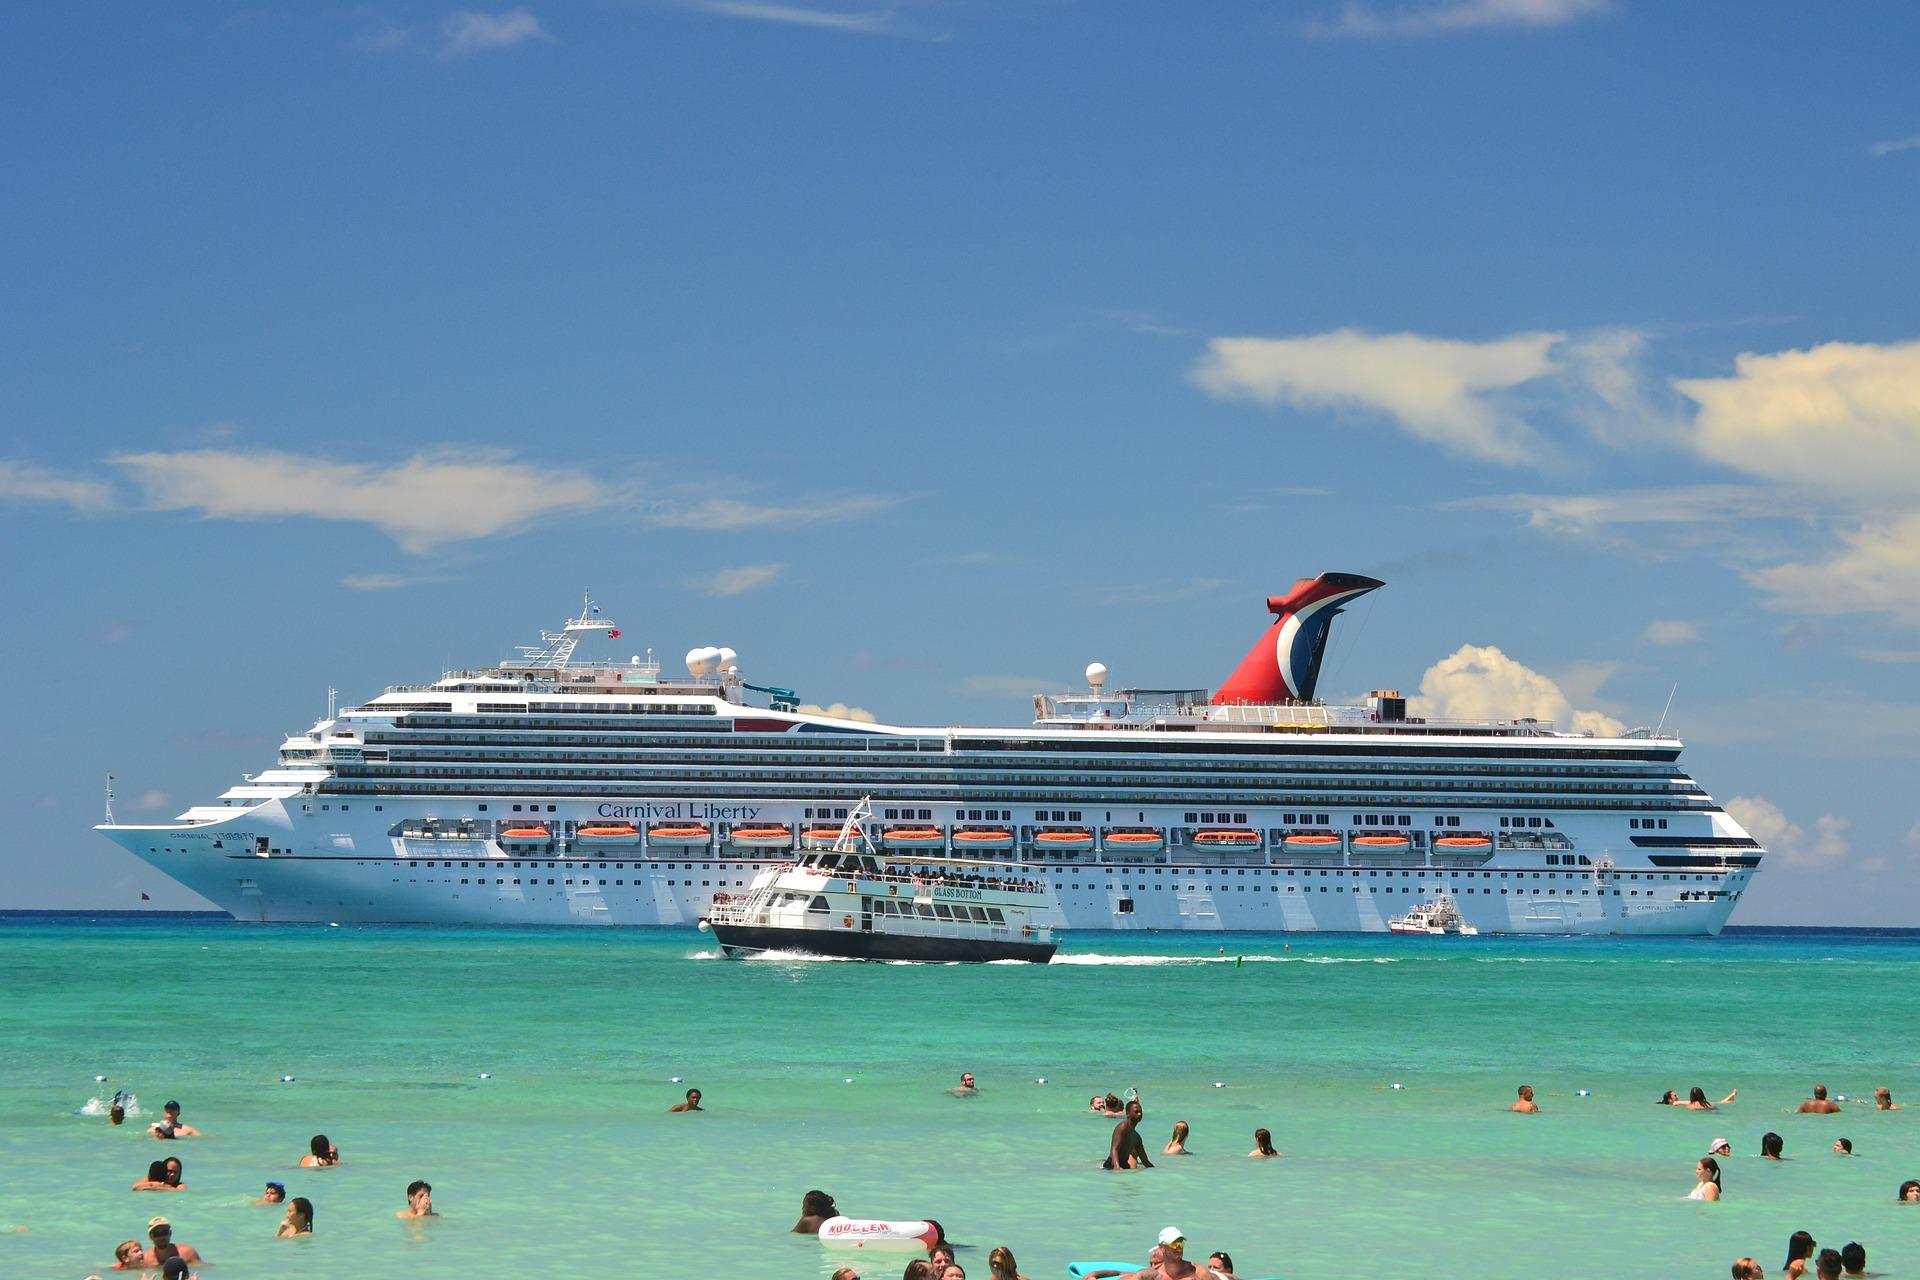 Carnival Cruise Ship out at sea, near the shore.